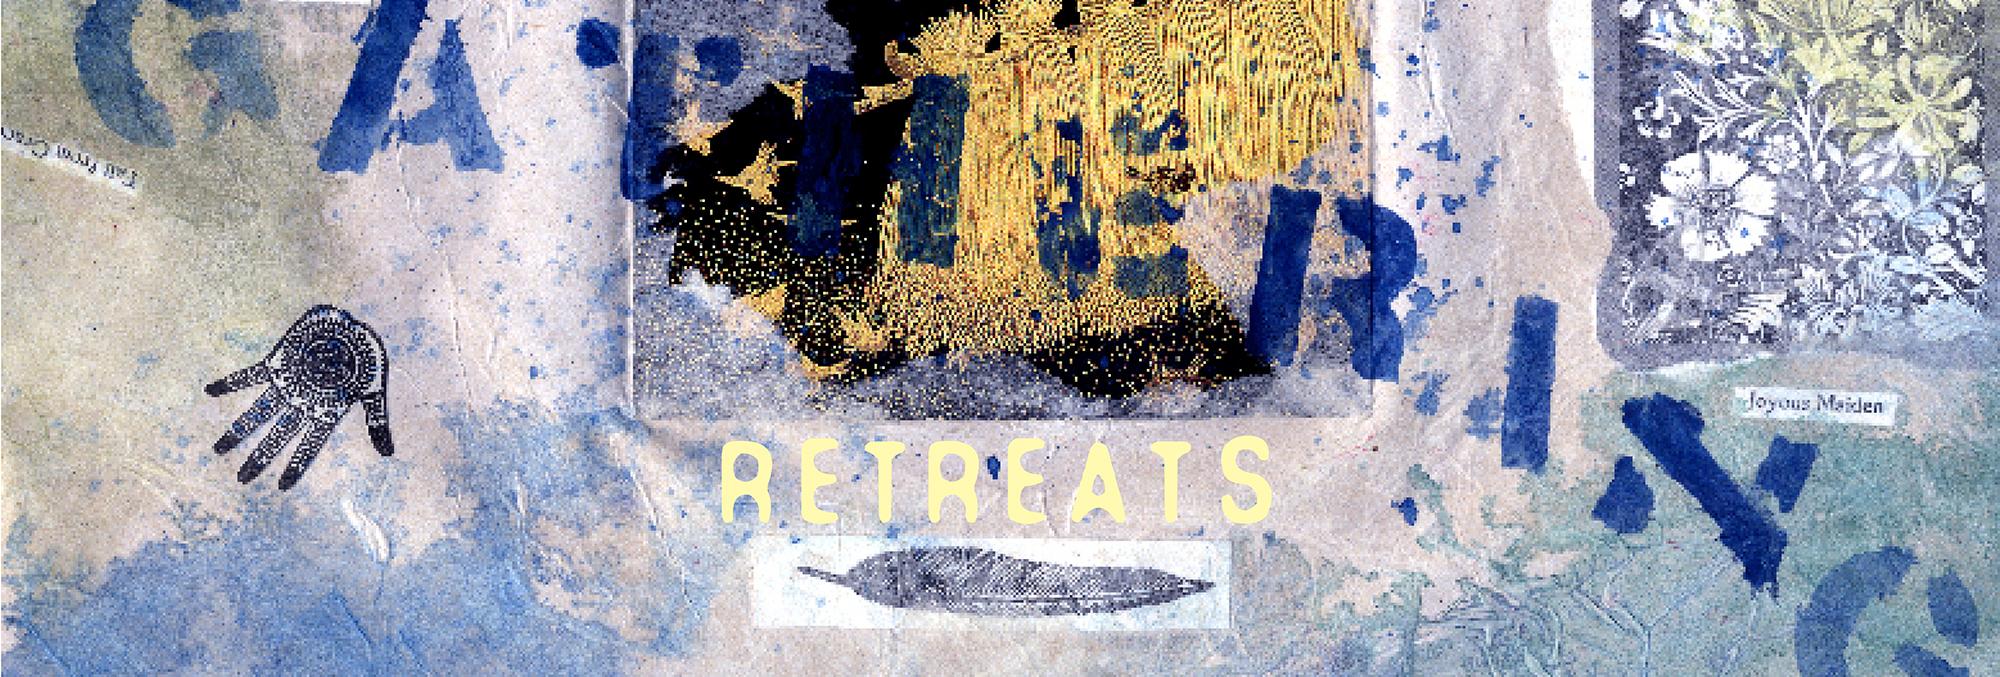 WS-Retreats-banner1